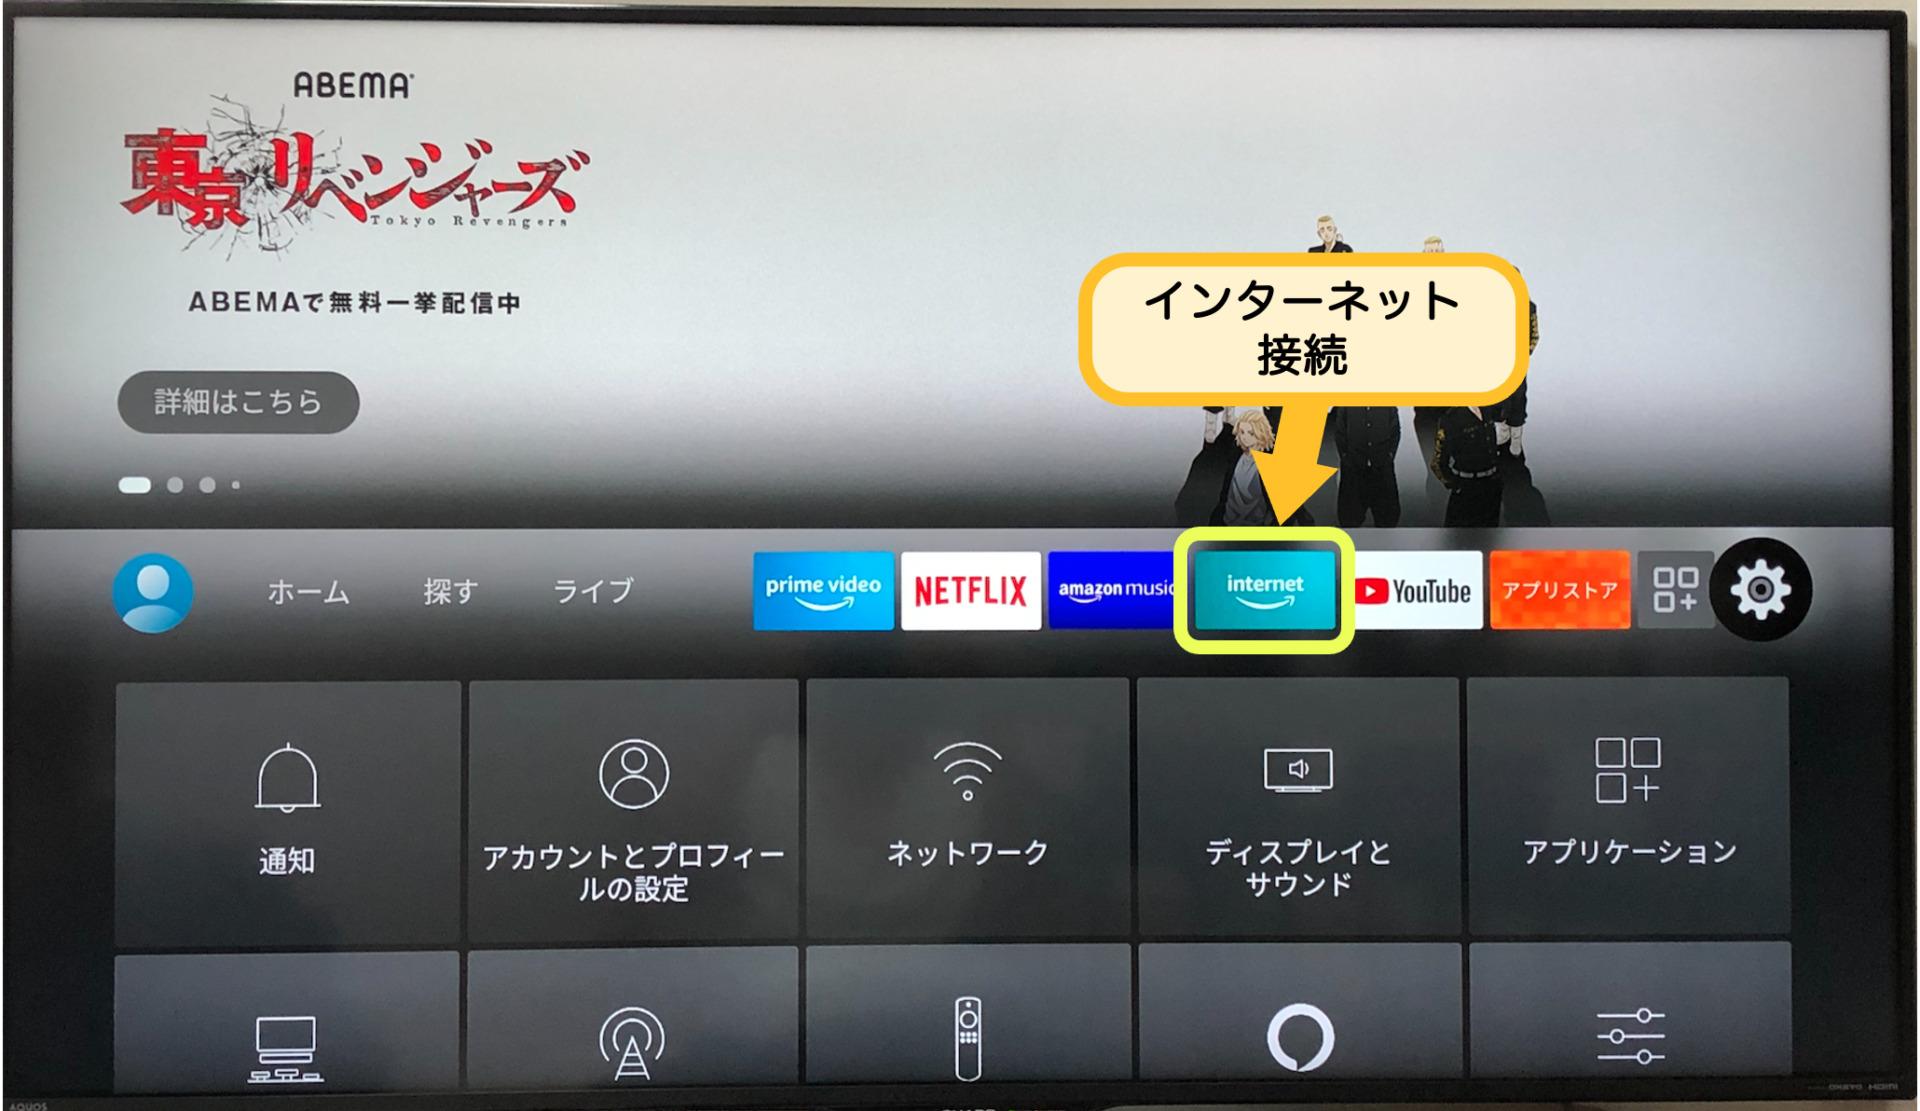 FireTVインターネット接続